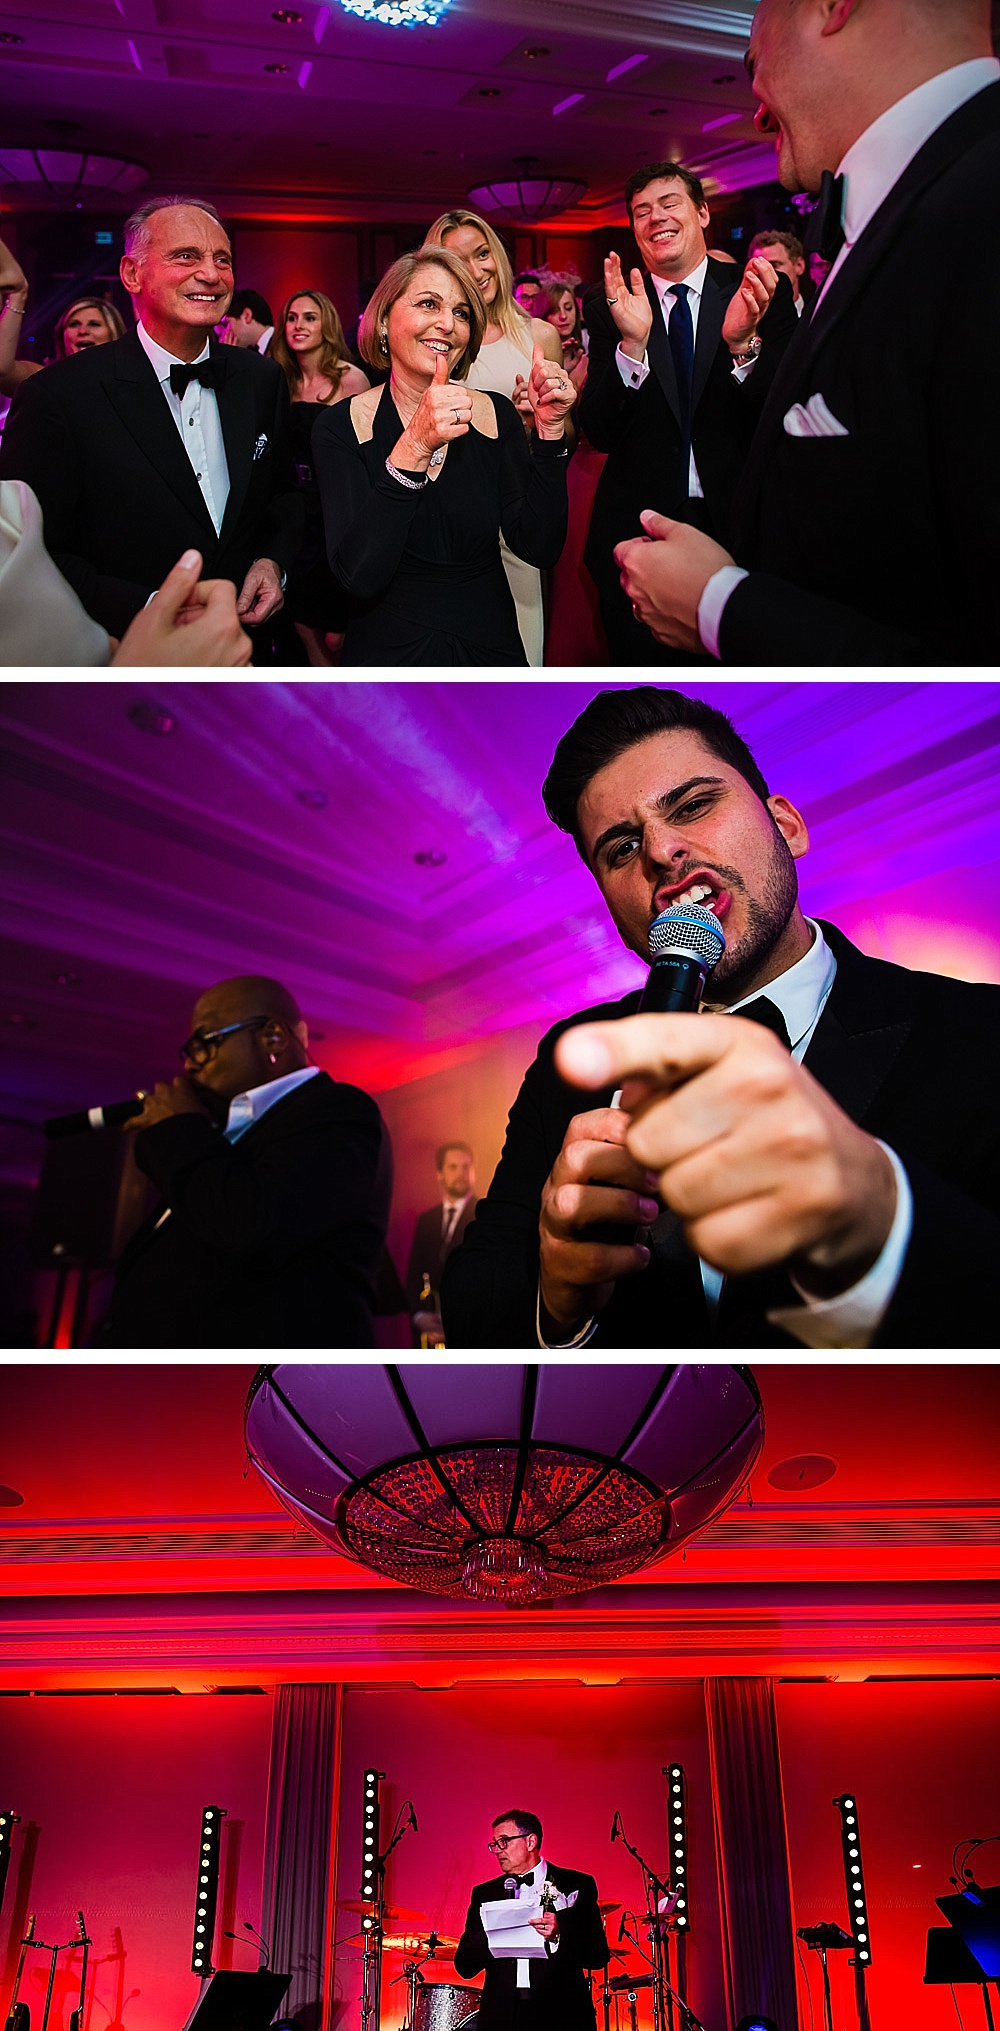 Romantic elegance Jewish wedding at the Rosewood Hotel Covent Garden London_0051